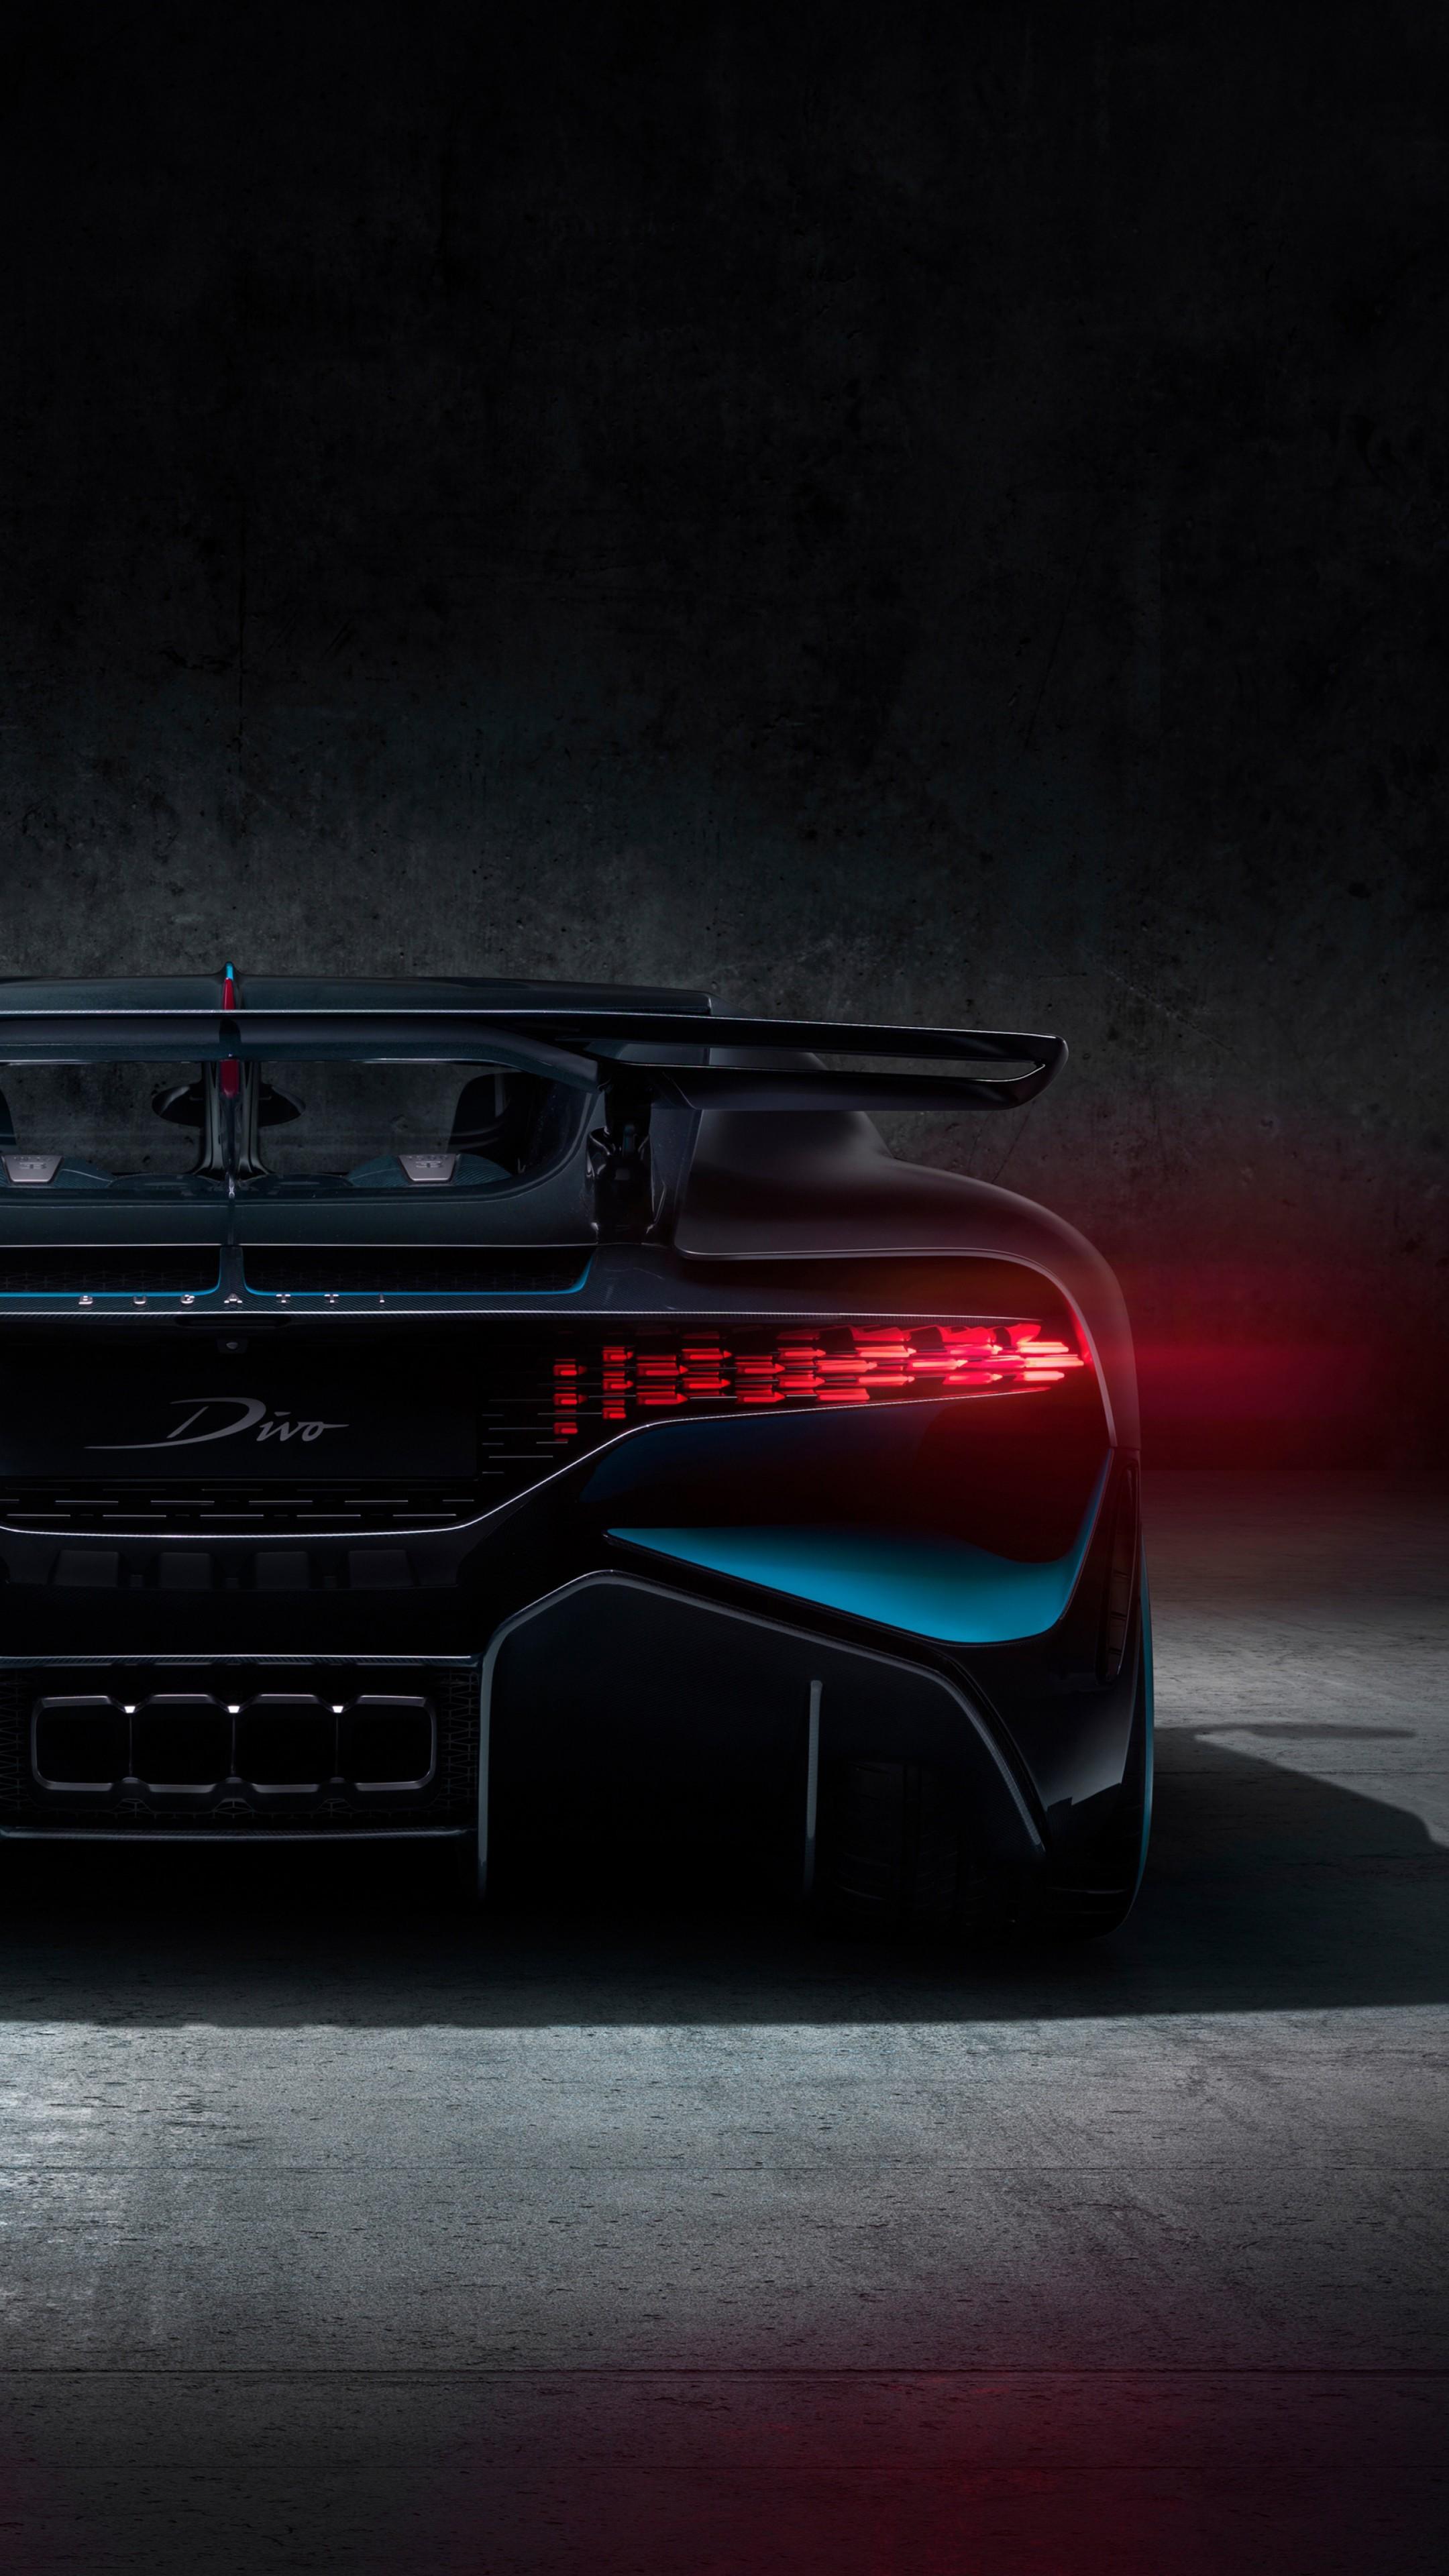 Wallpaper Bugatti Divo 2019 Cars Supercar 4k Cars